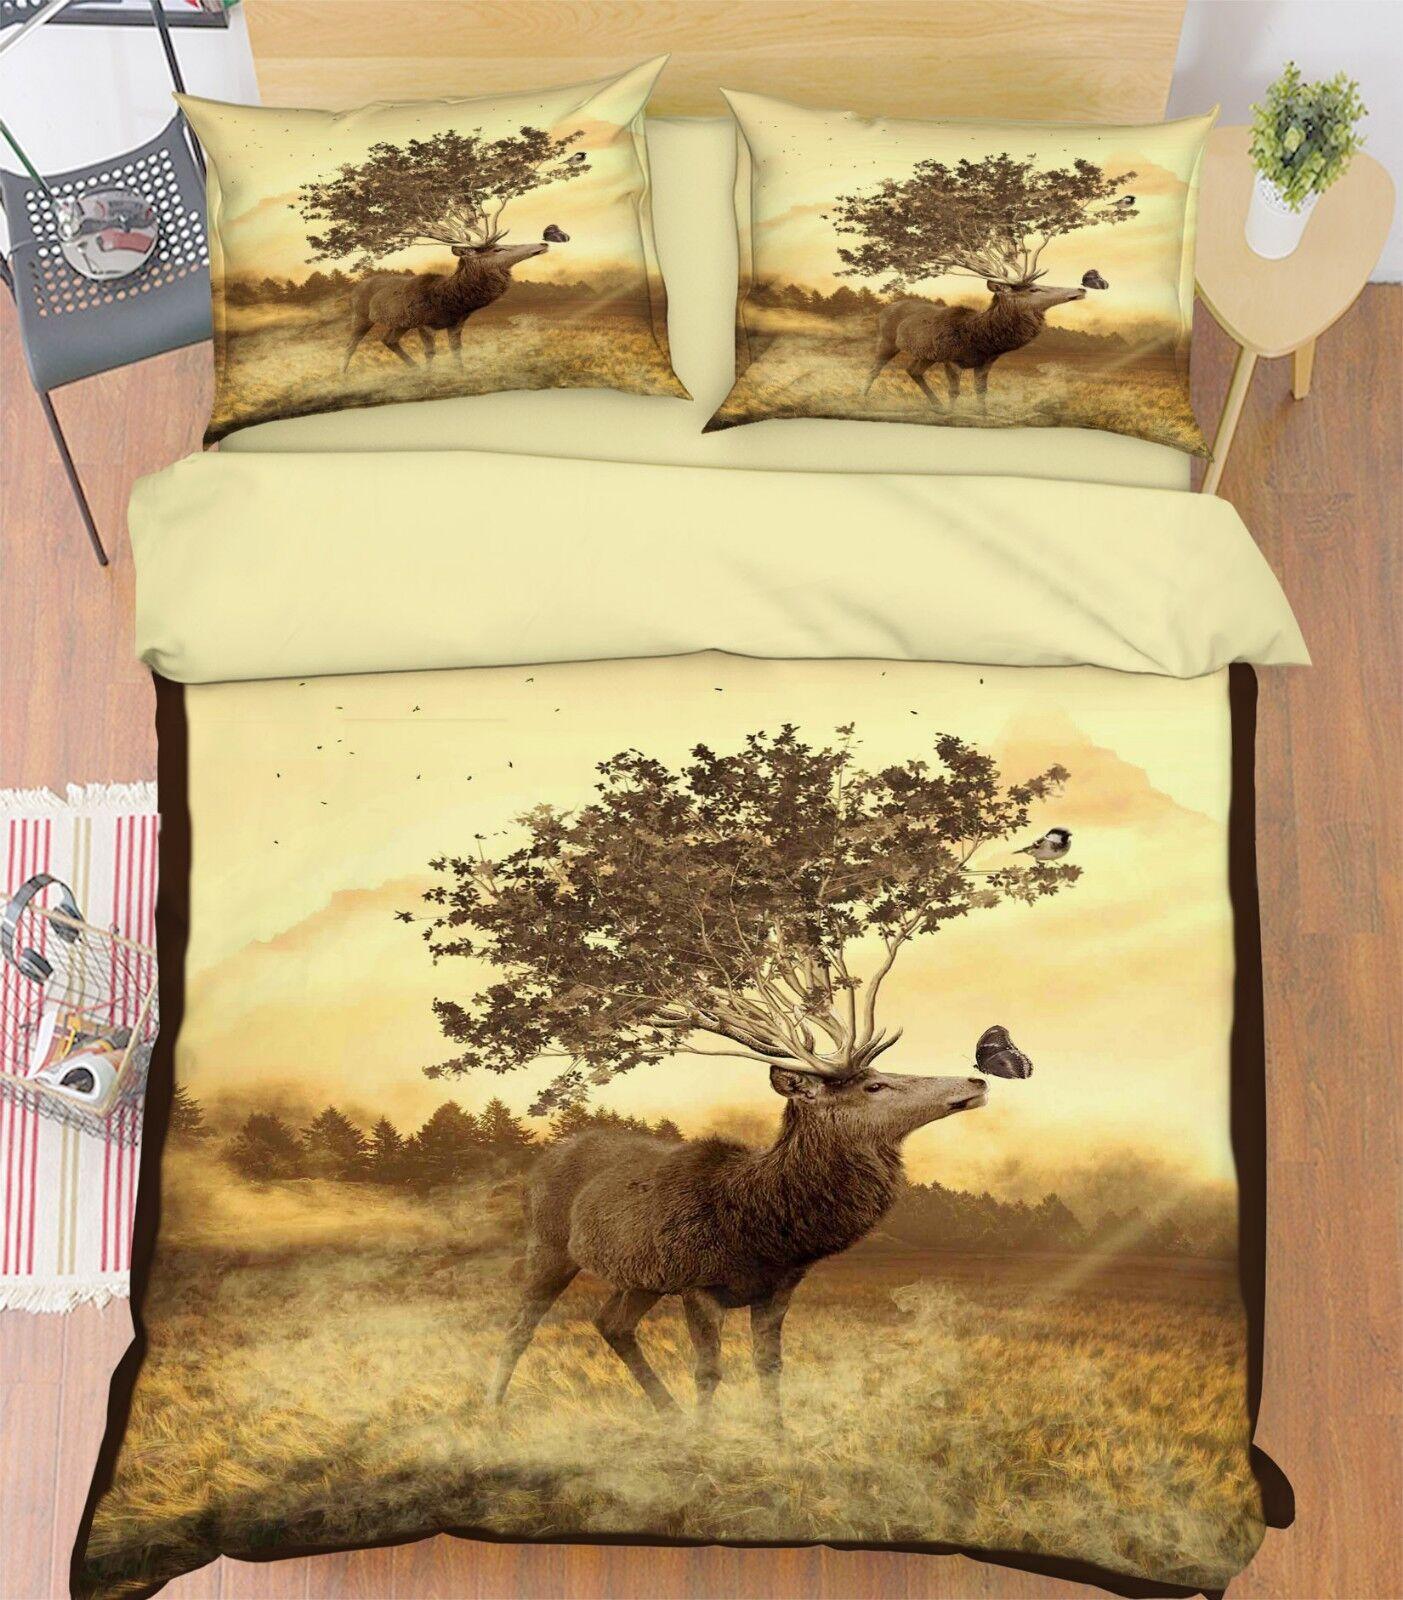 3D Meadow Deer 683 Bed Pillowcases Quilt Duvet Cover Set Single King UK Summer